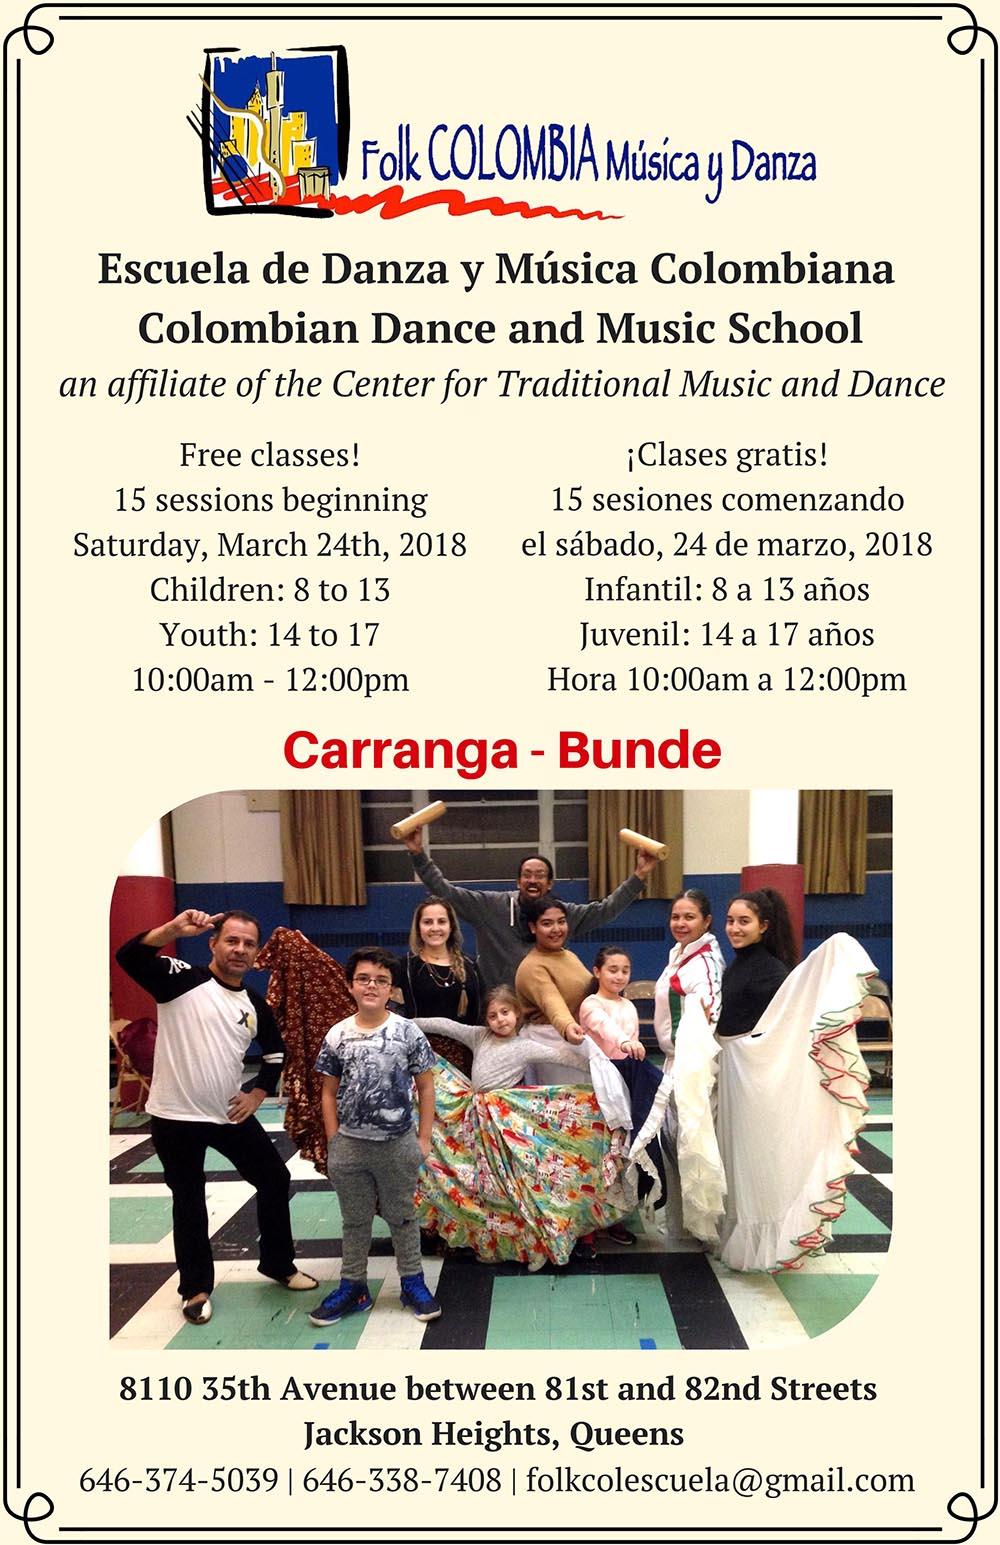 FolkCOLOMBIA music classes